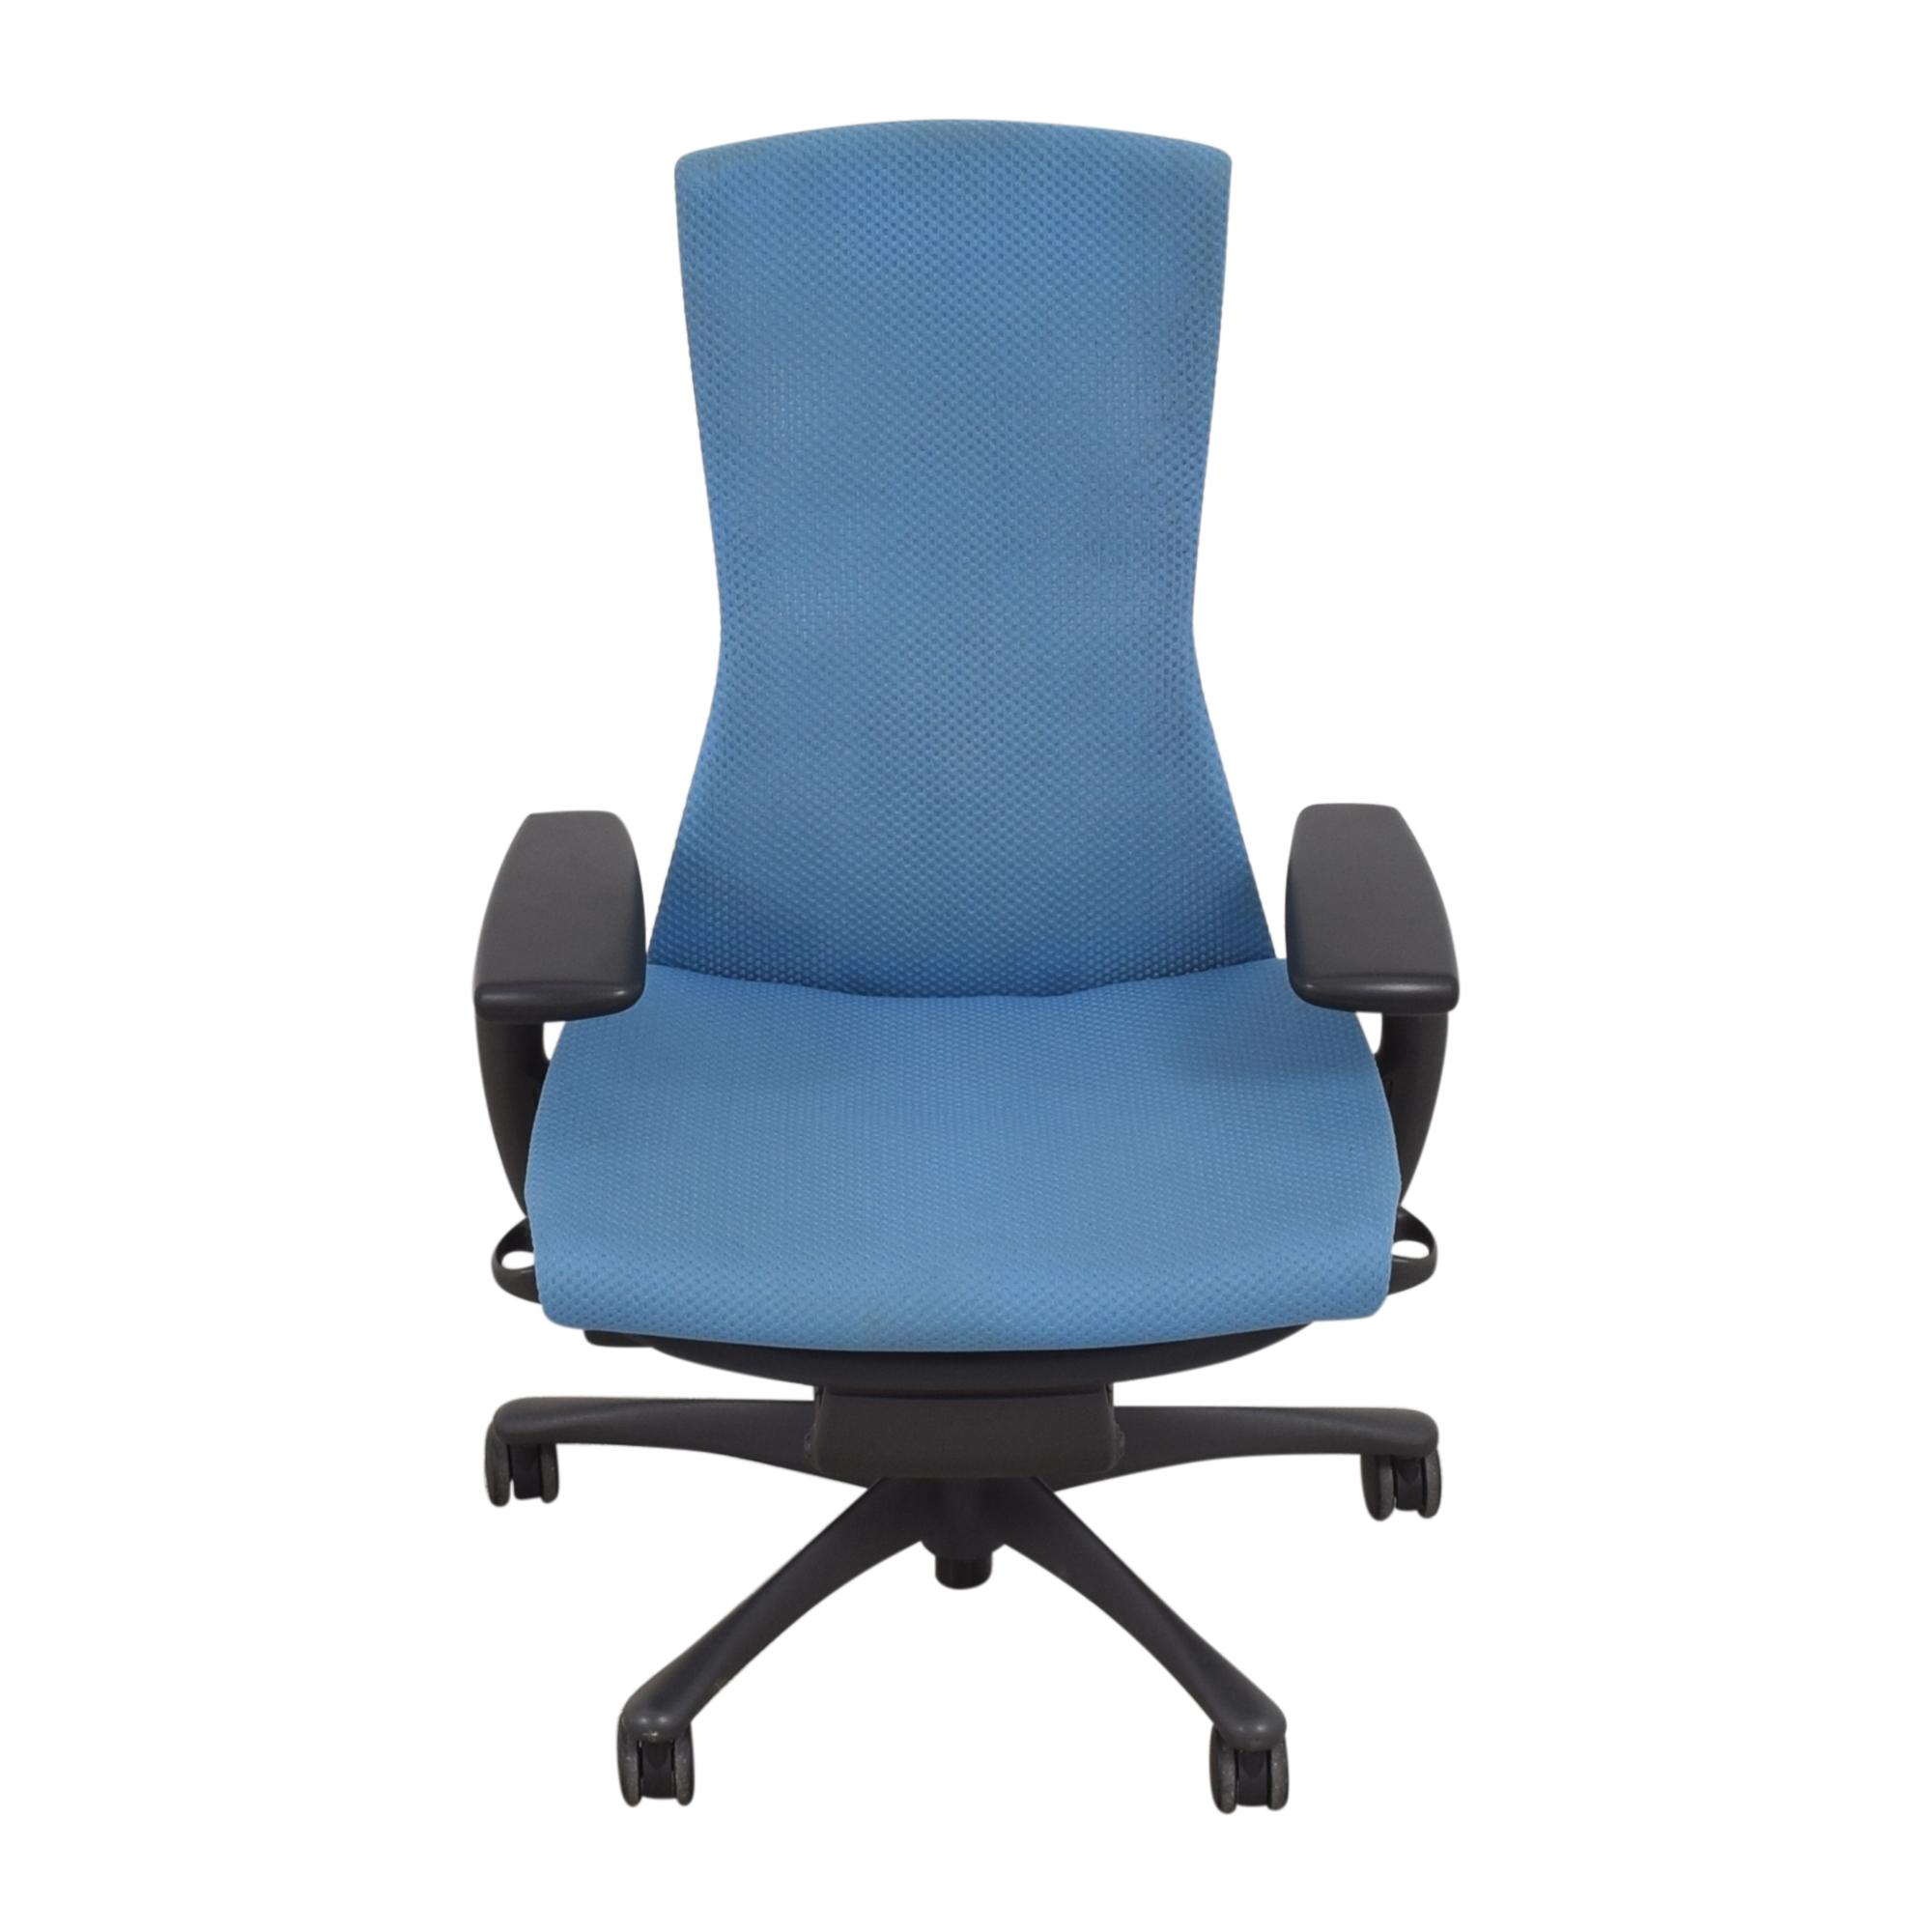 Herman Miller Embody Chair / Chairs